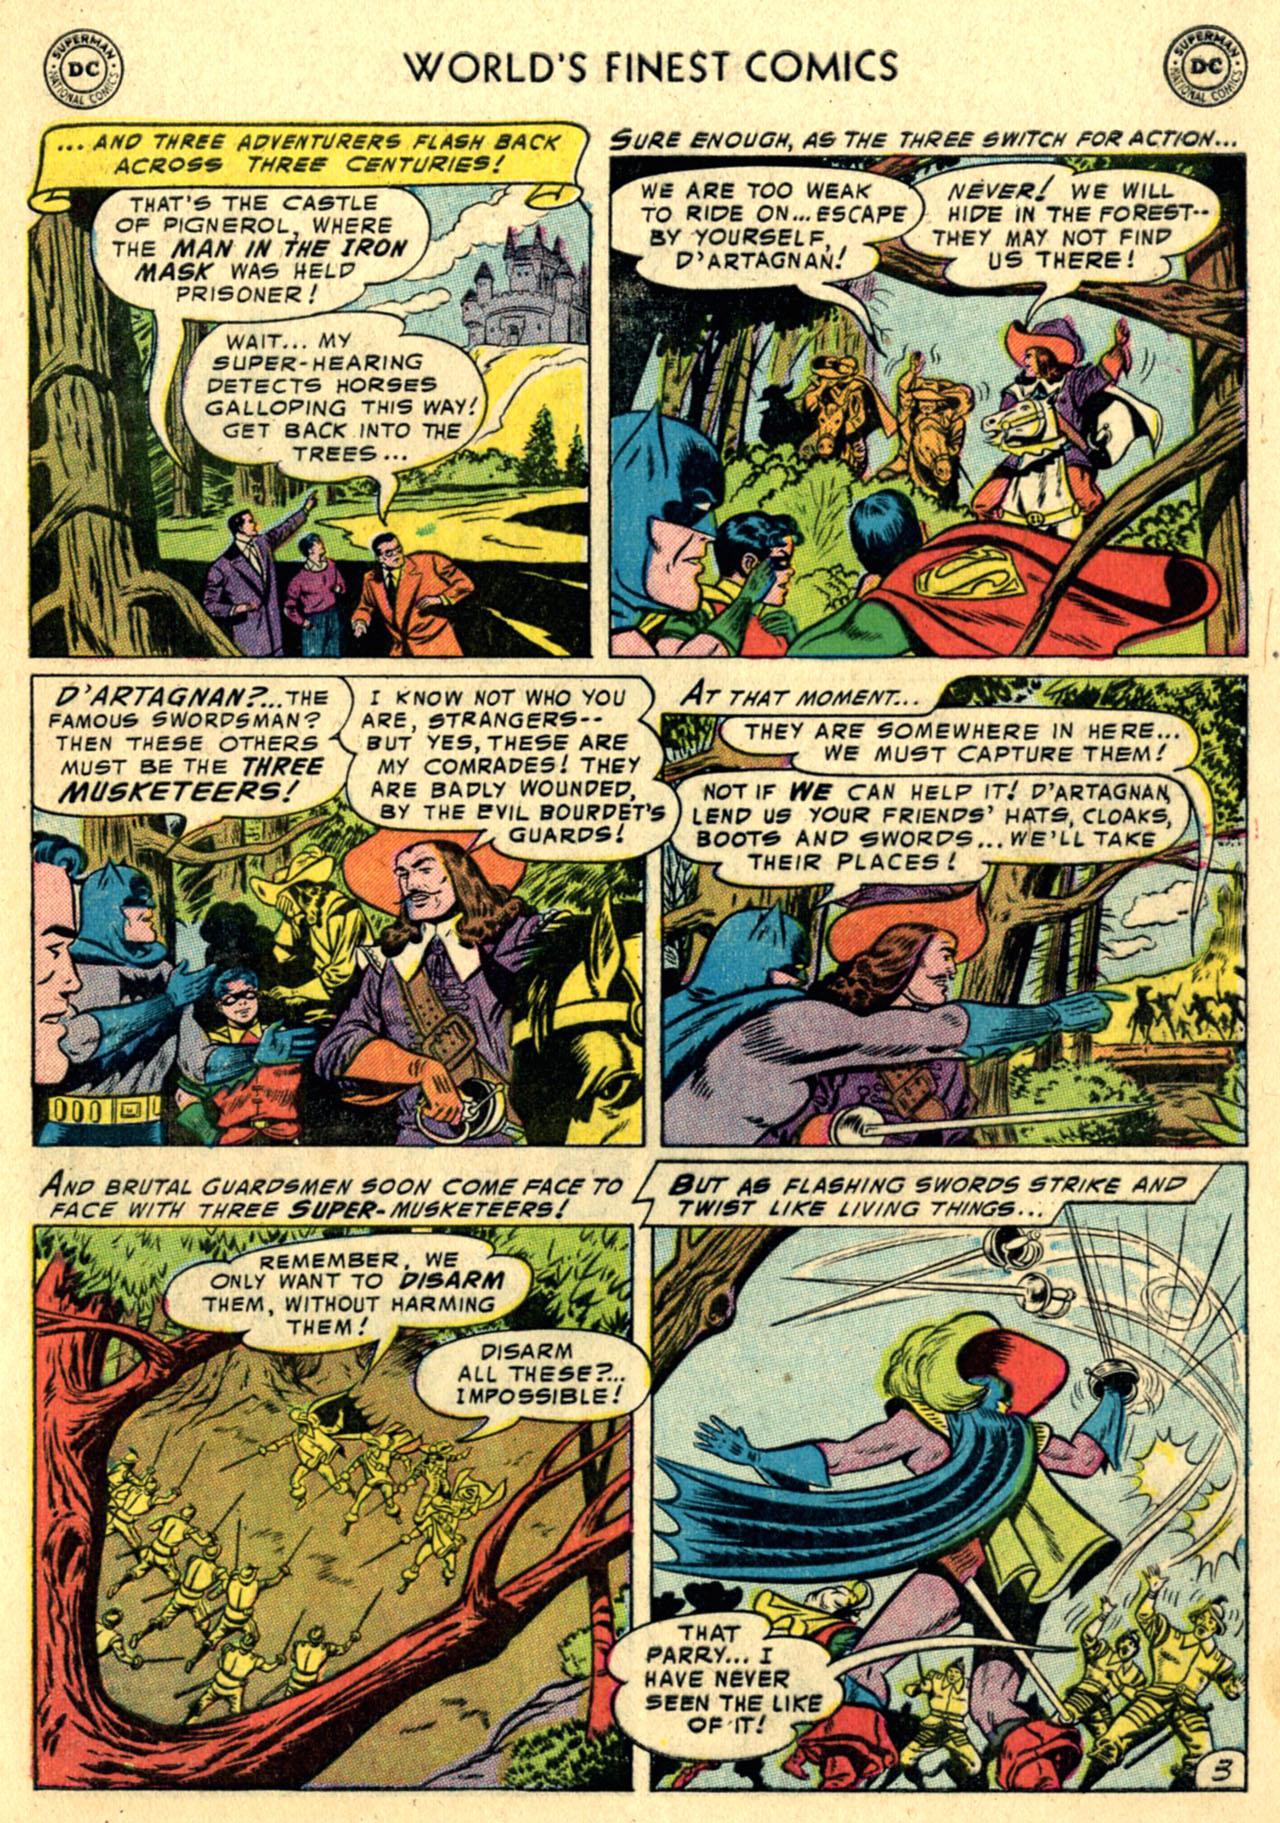 Read online World's Finest Comics comic -  Issue #82 - 5